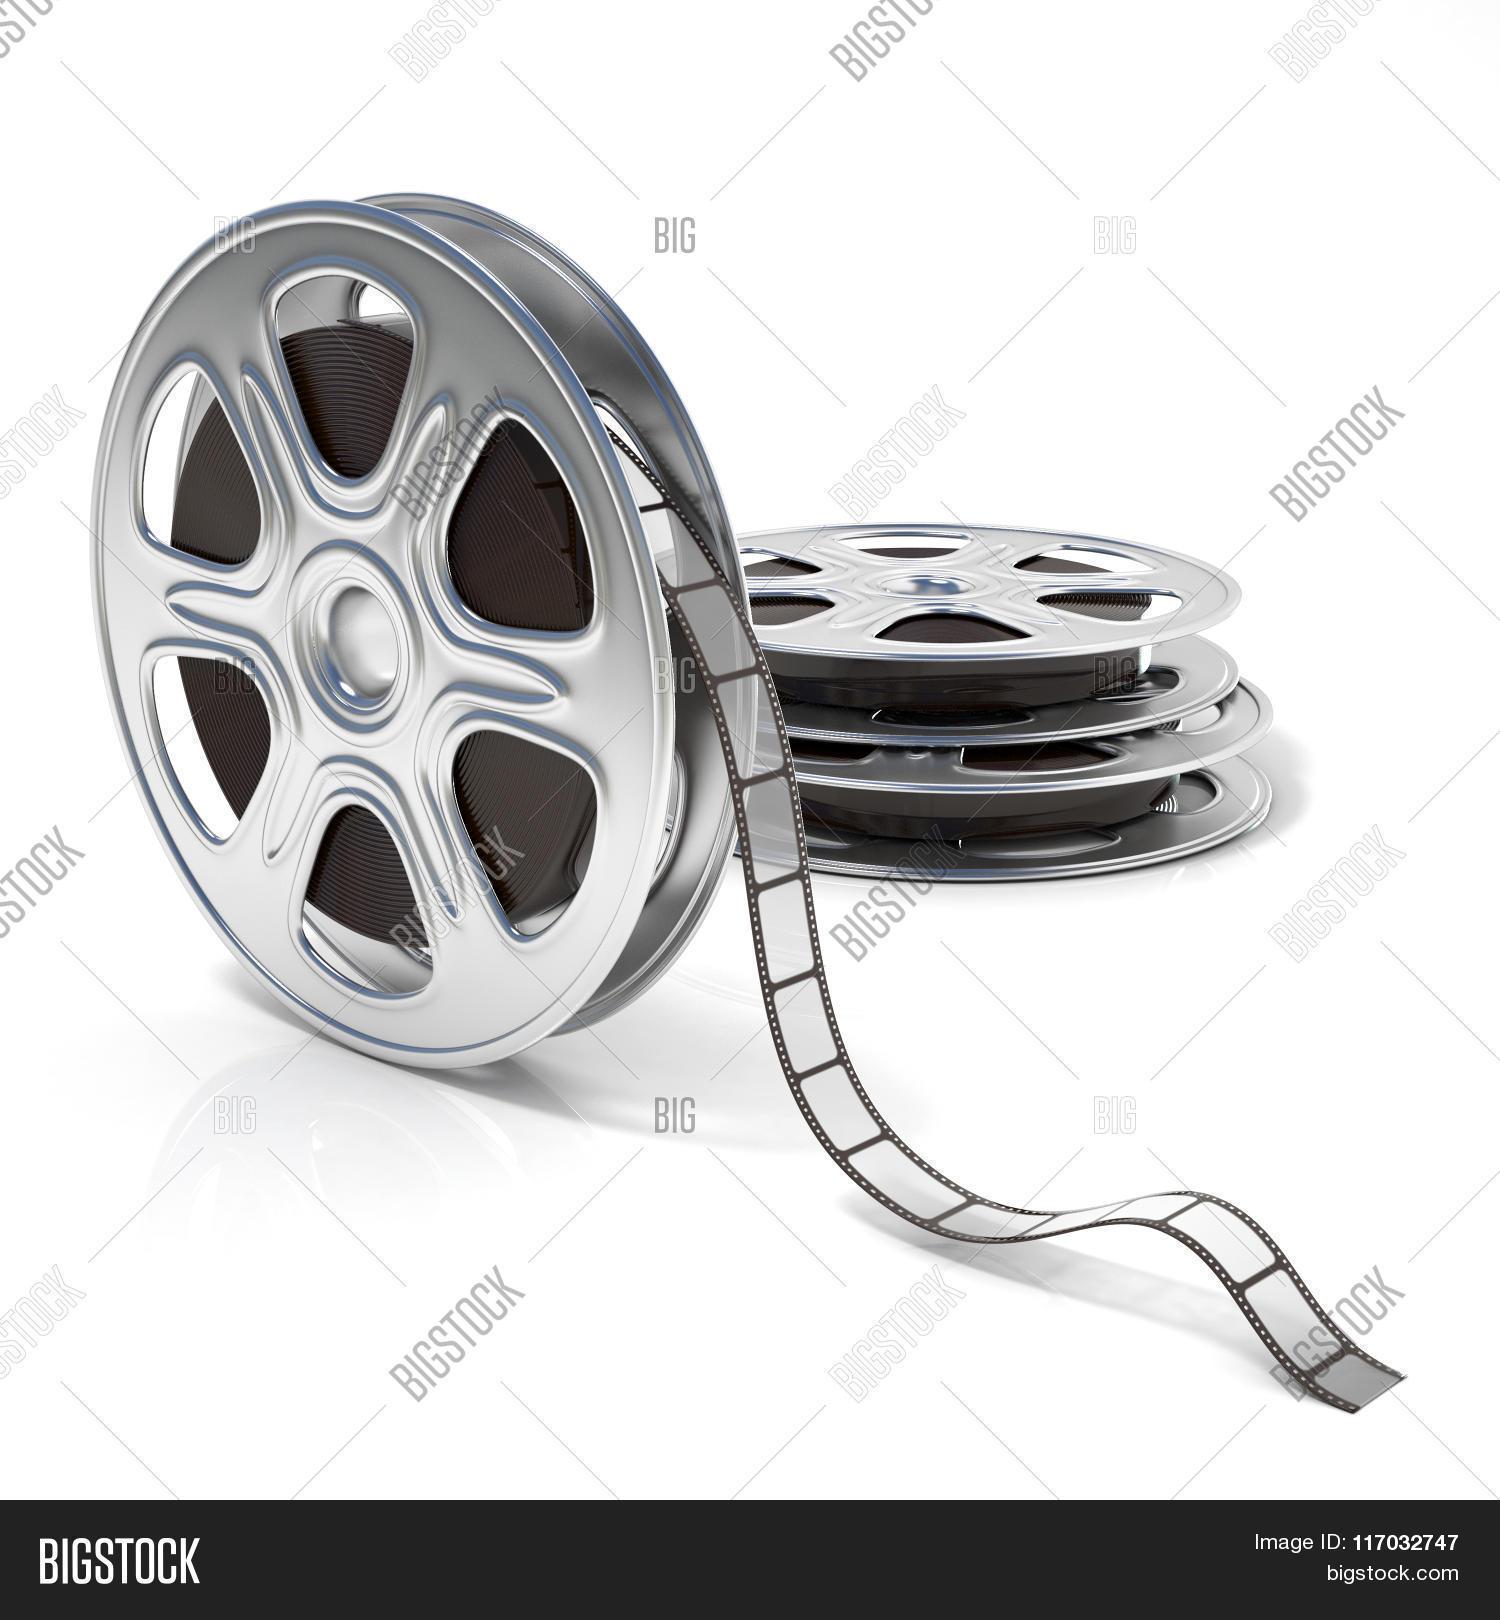 Film reels video icon image photo free trial bigstock film reels video icon 3d thecheapjerseys Choice Image